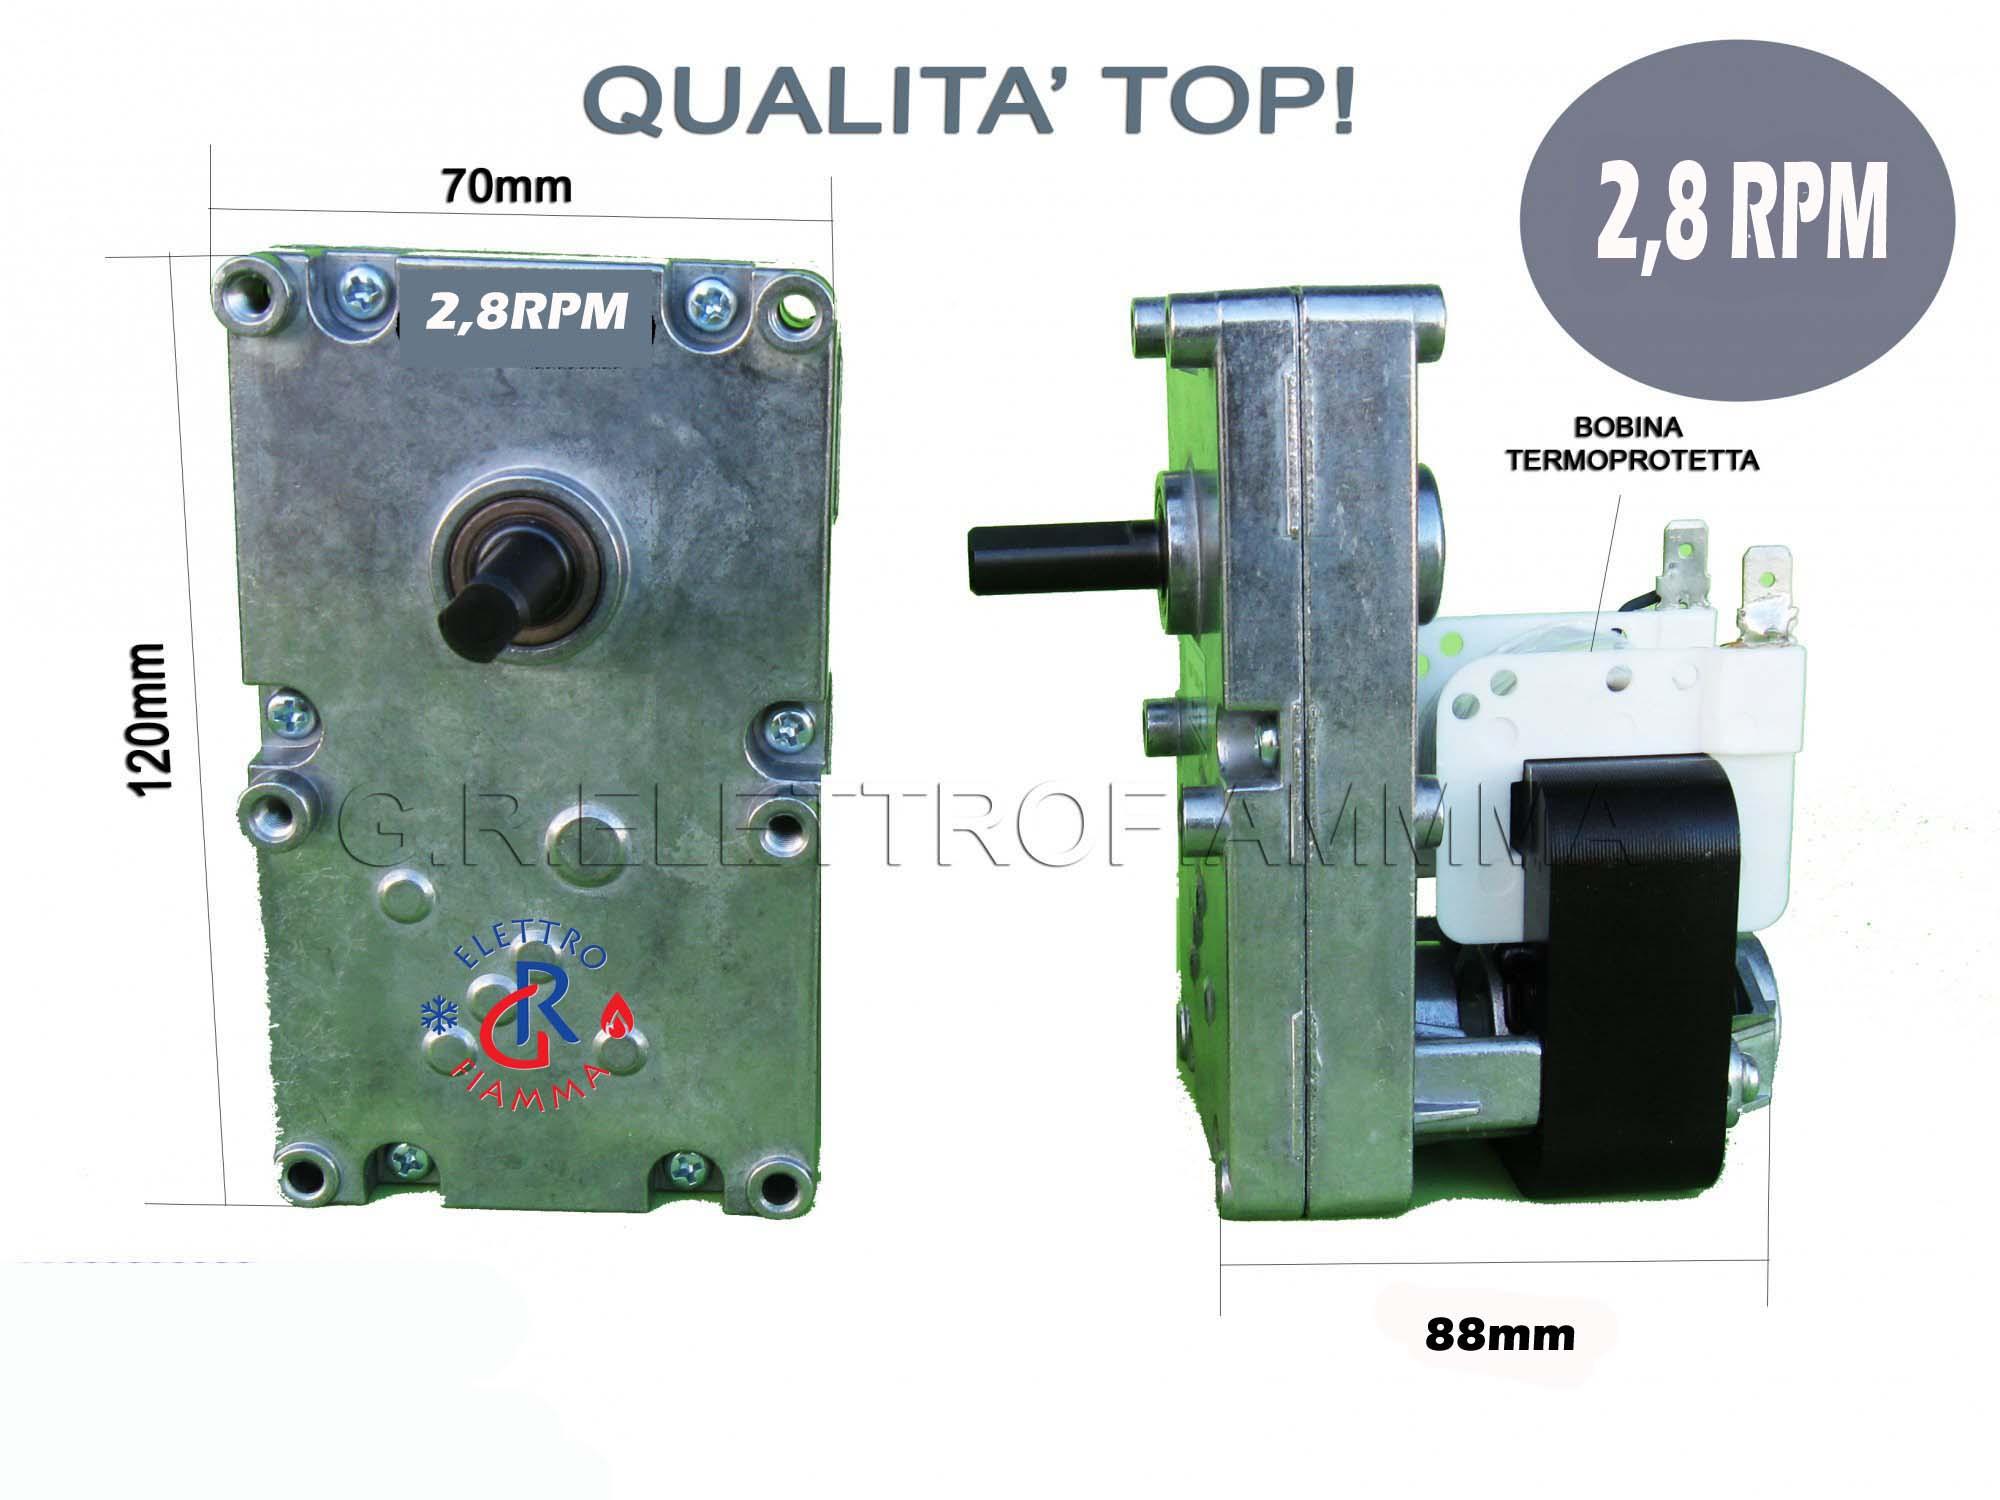 MOTORIDUTTORE STUFA PELLET 4.75 RPM ALBERO D 8.5 ARCE EXTRAFLAME DAL ZOTTO  ECC.